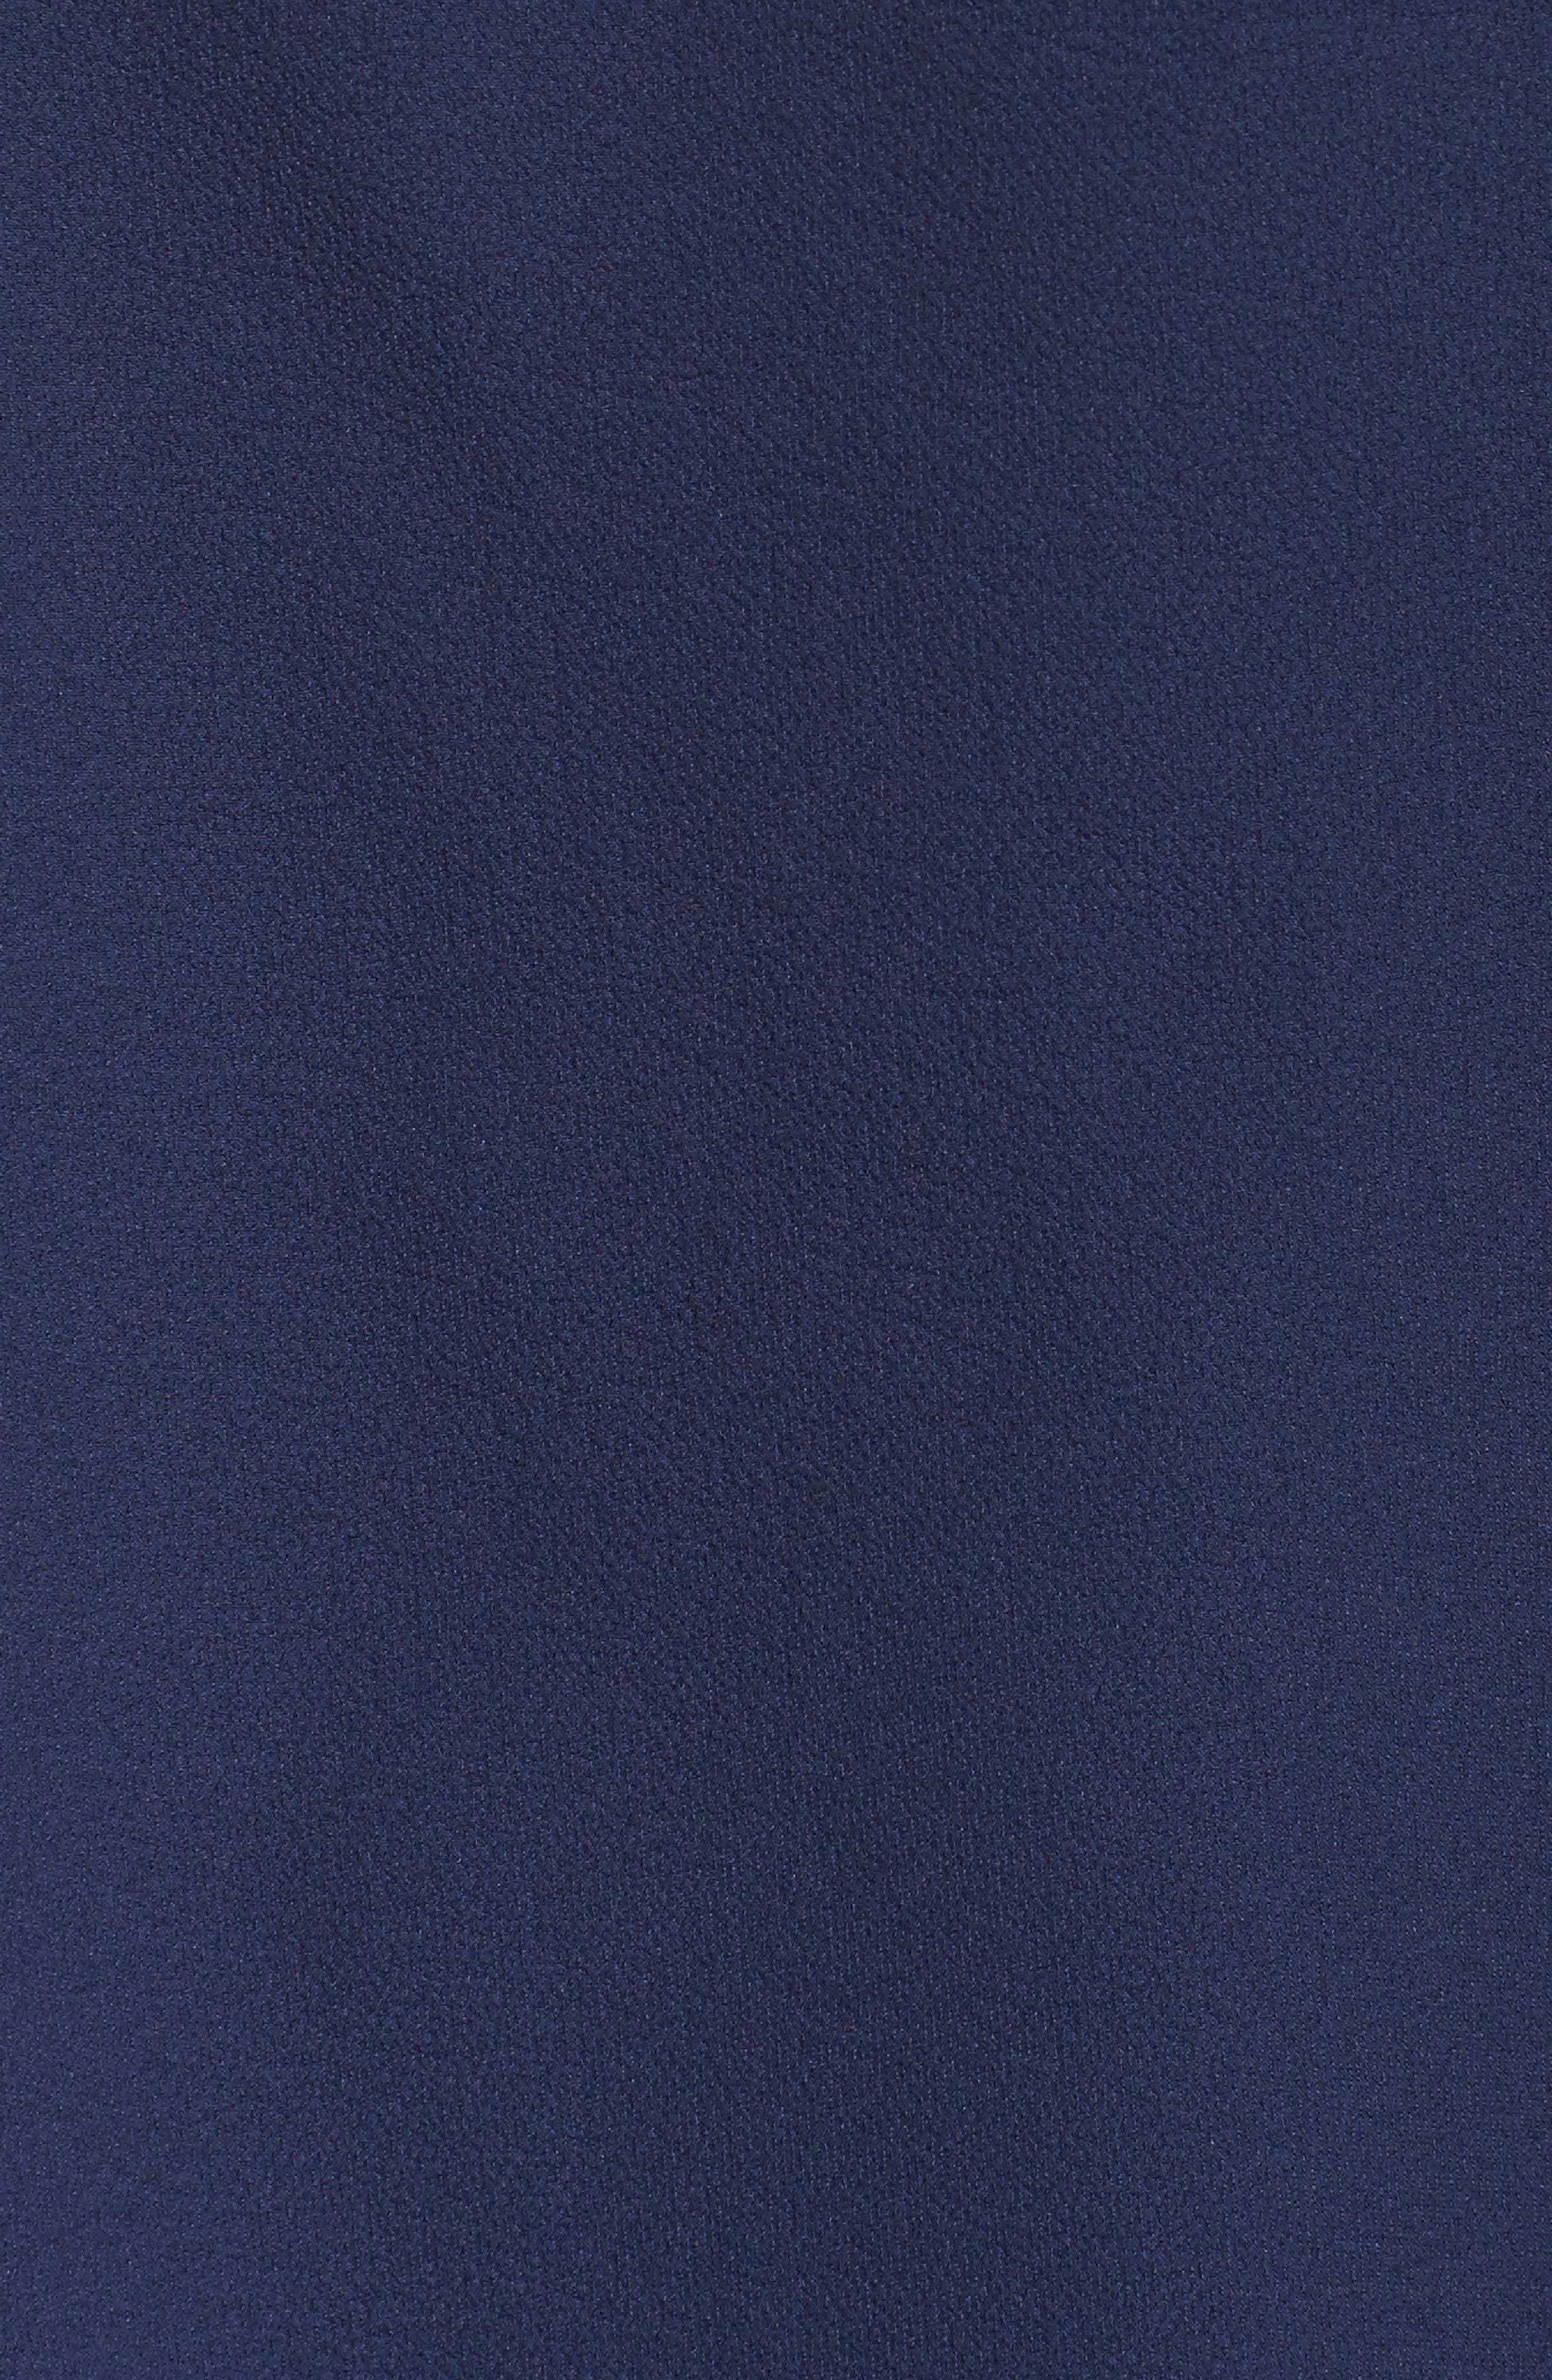 Off the Shoulder Ruffle Dress,                             Alternate thumbnail 34, color,